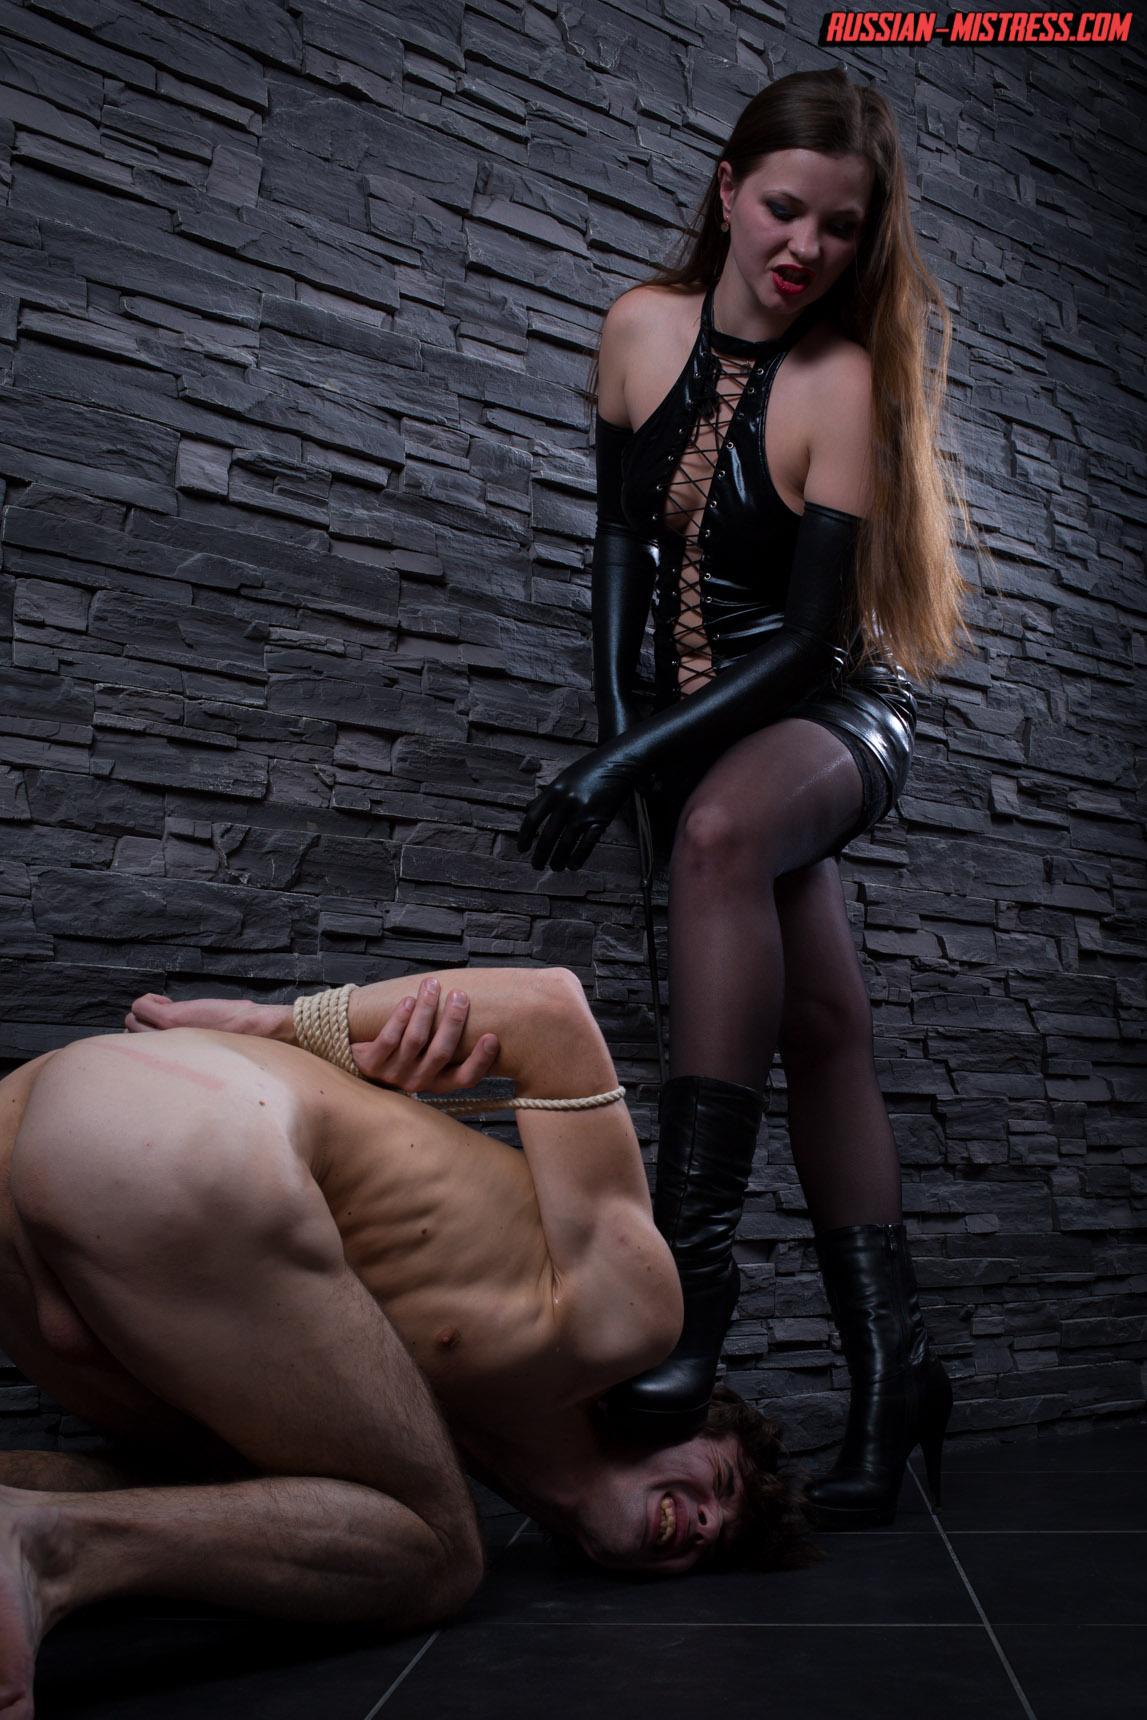 http://russianmistress.femdomworld.com/222/03/pics/img05.jpg